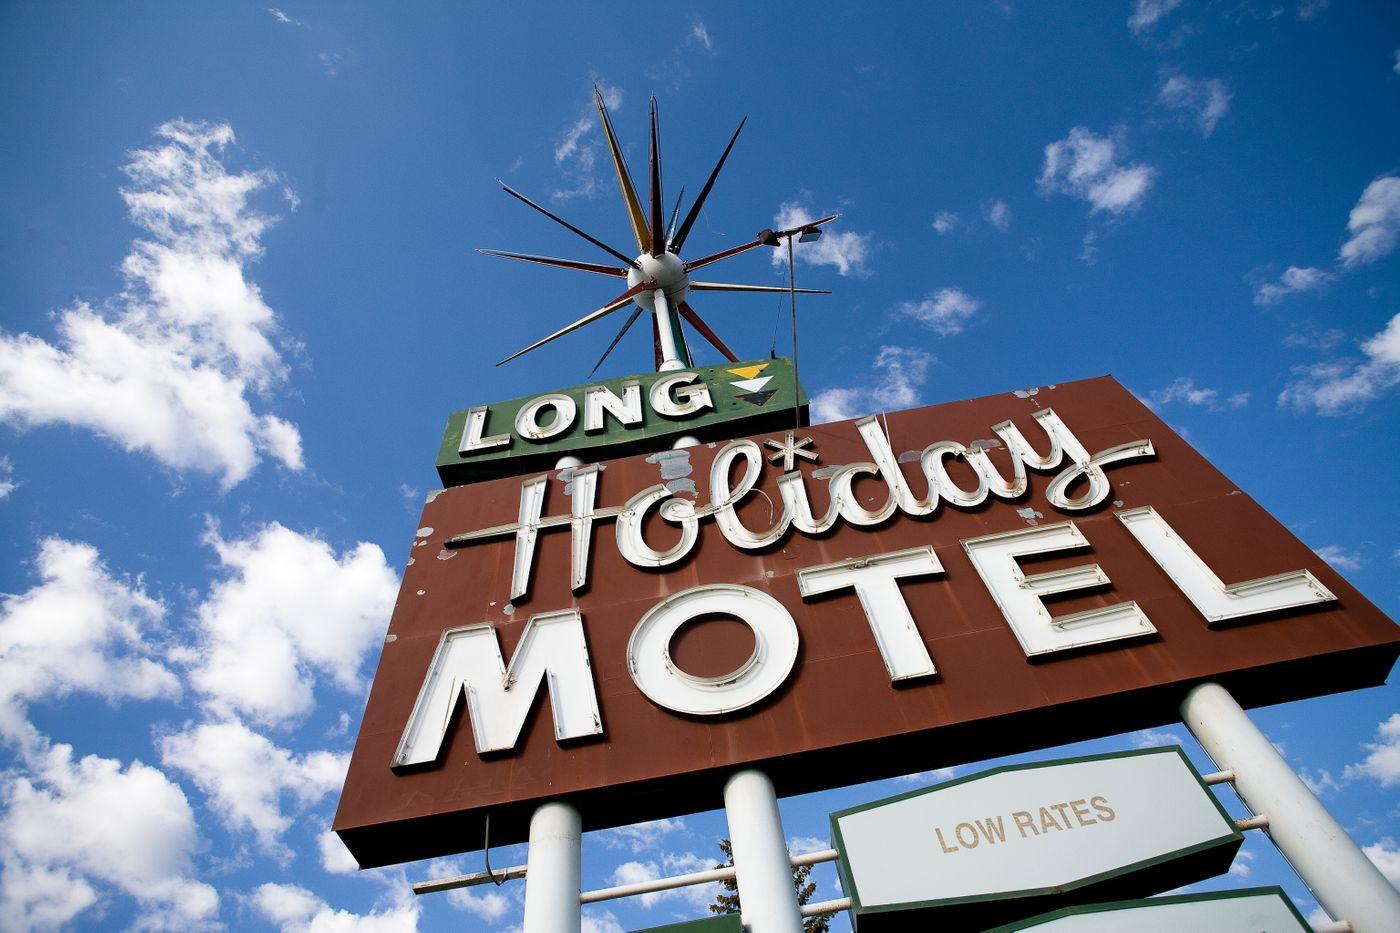 motel-web-2020-jpg-10-PRINT.jpg